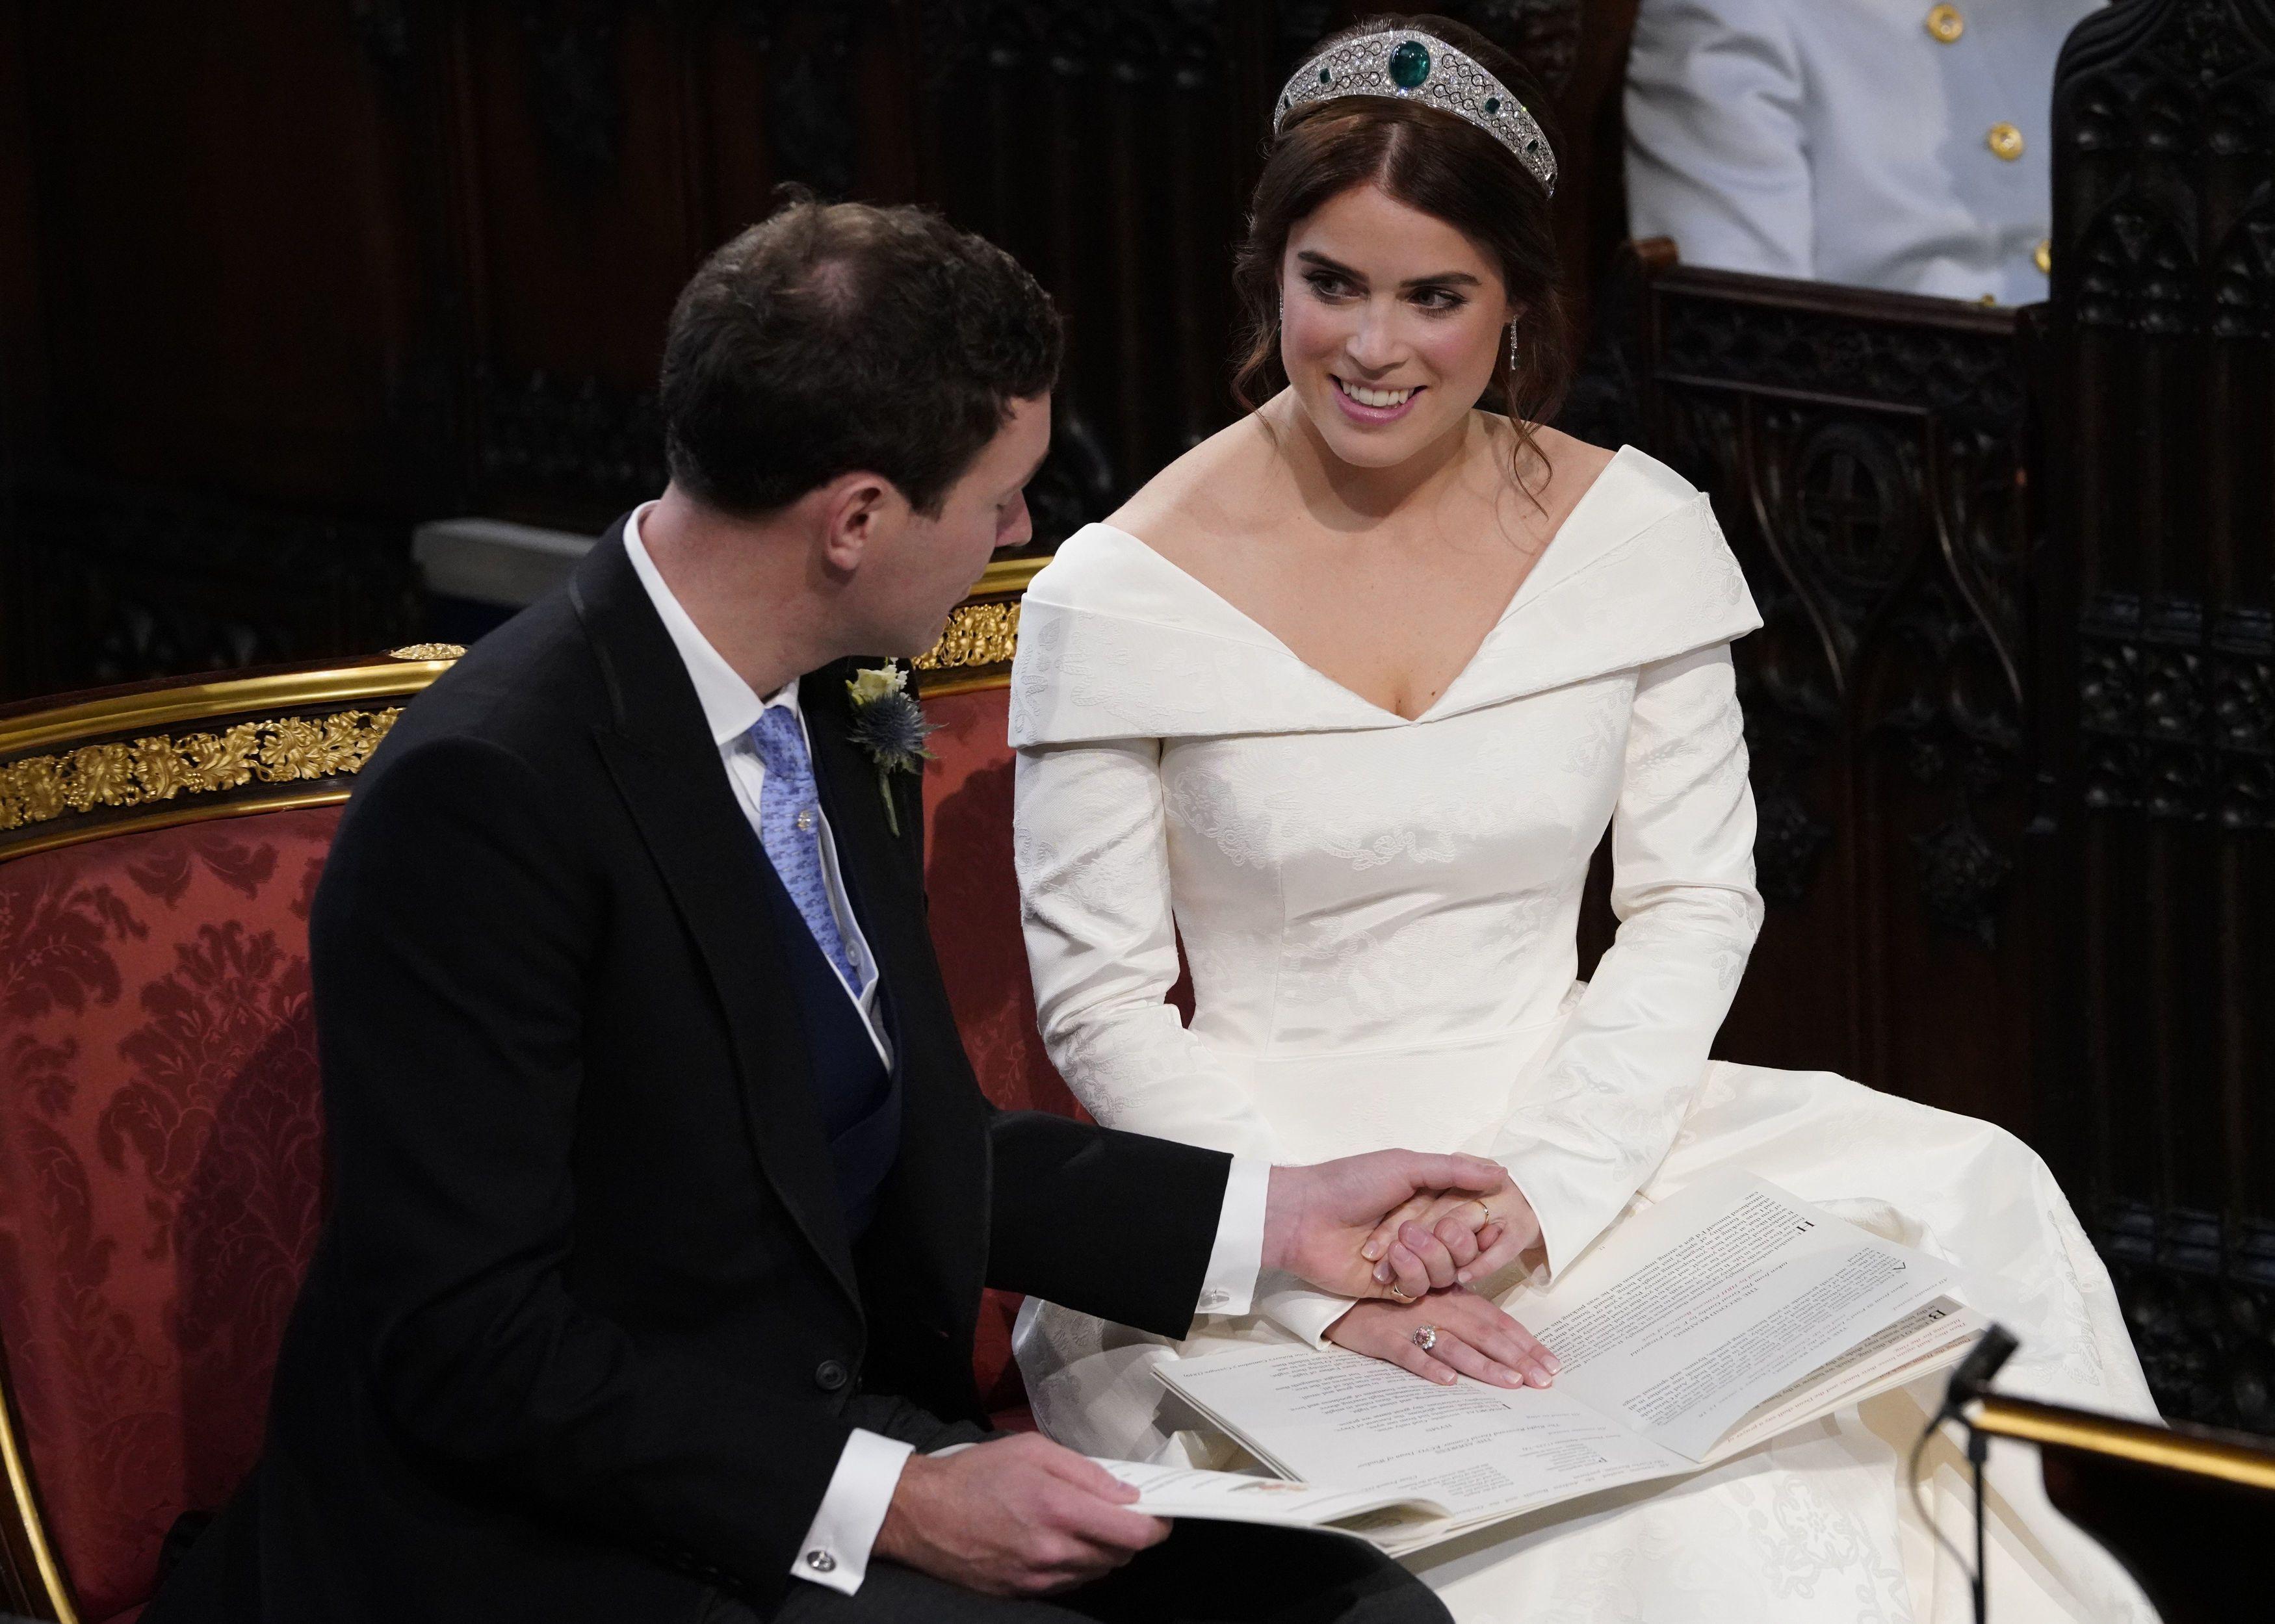 The emotional reason behind Princess Beatrice's reading at the royal wedding